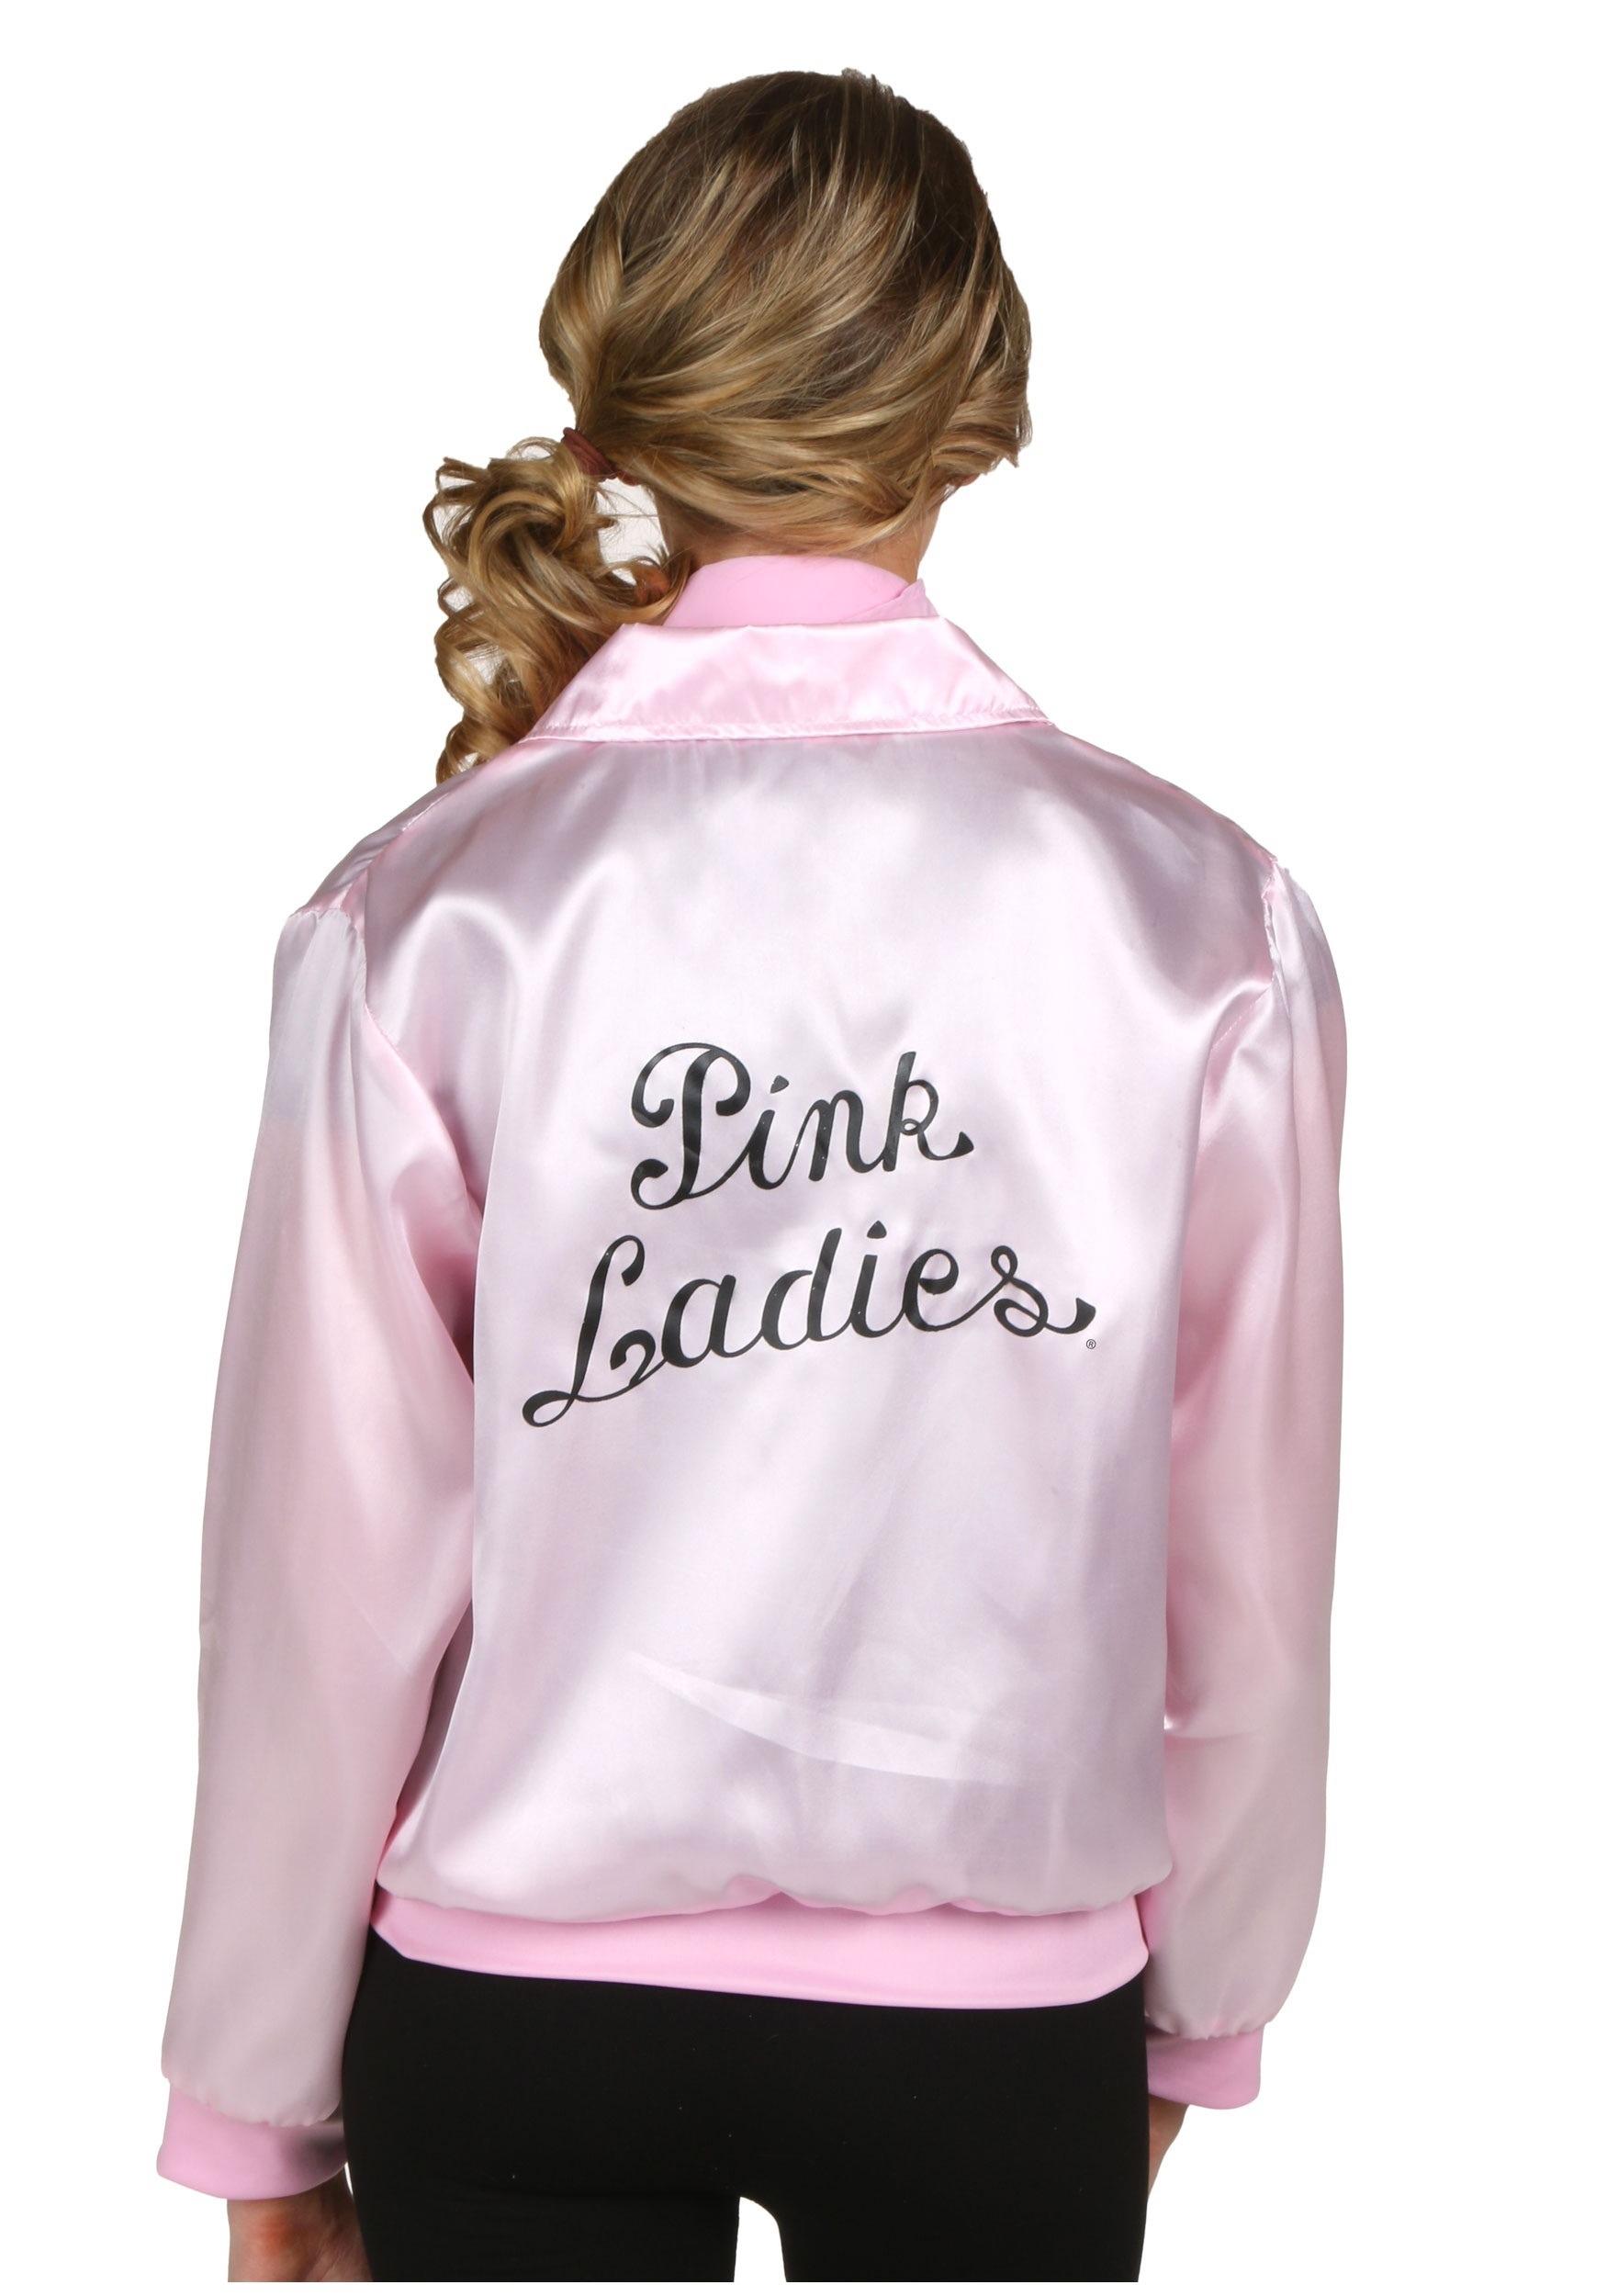 Womens pink life jacket